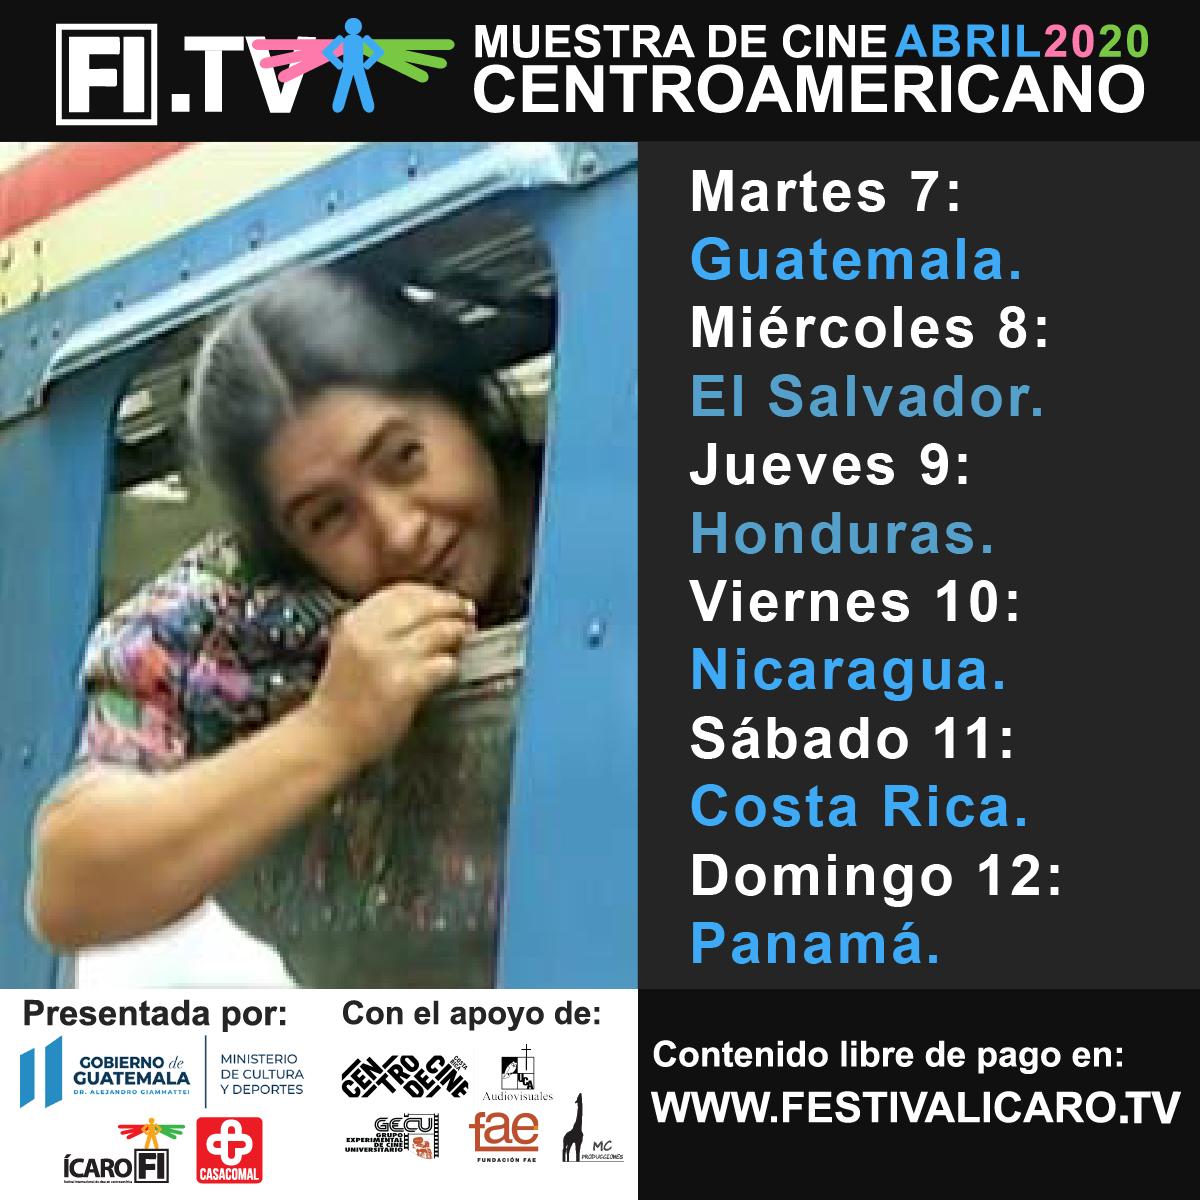 www.festivalicaro.tv